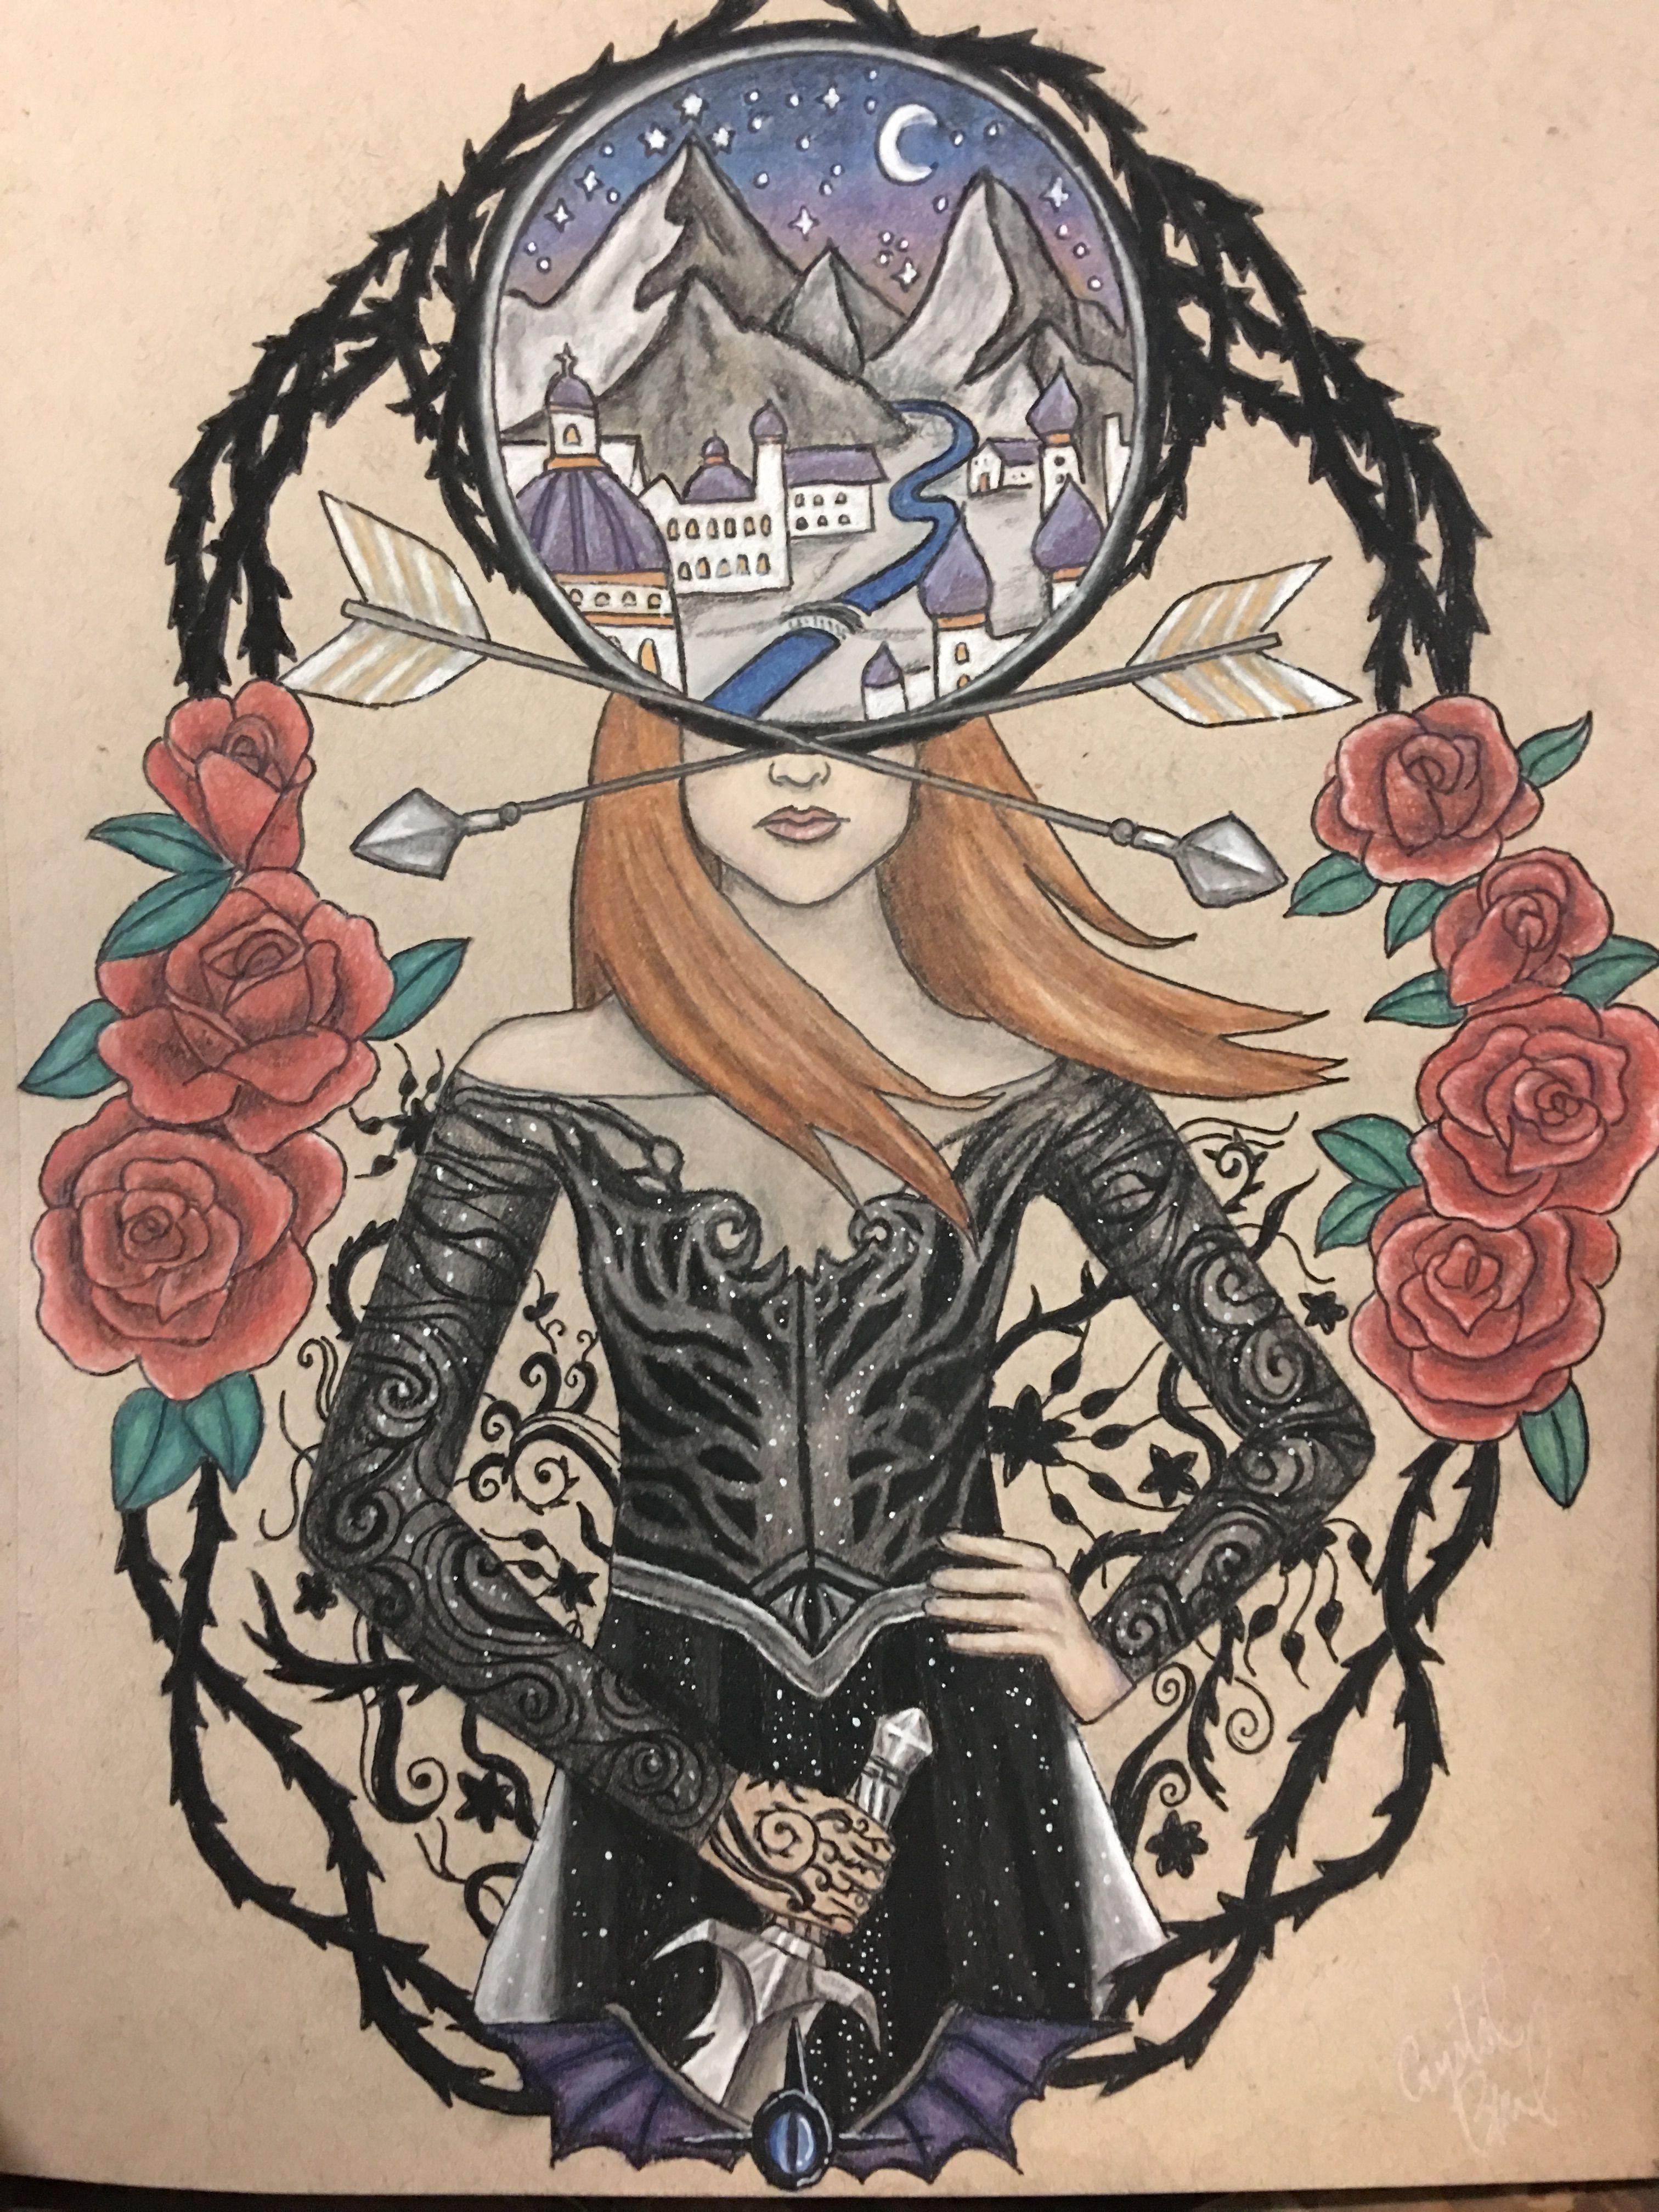 Acotar Tattoo Design Mscrystalbeard Throne Of Glass A Court Of